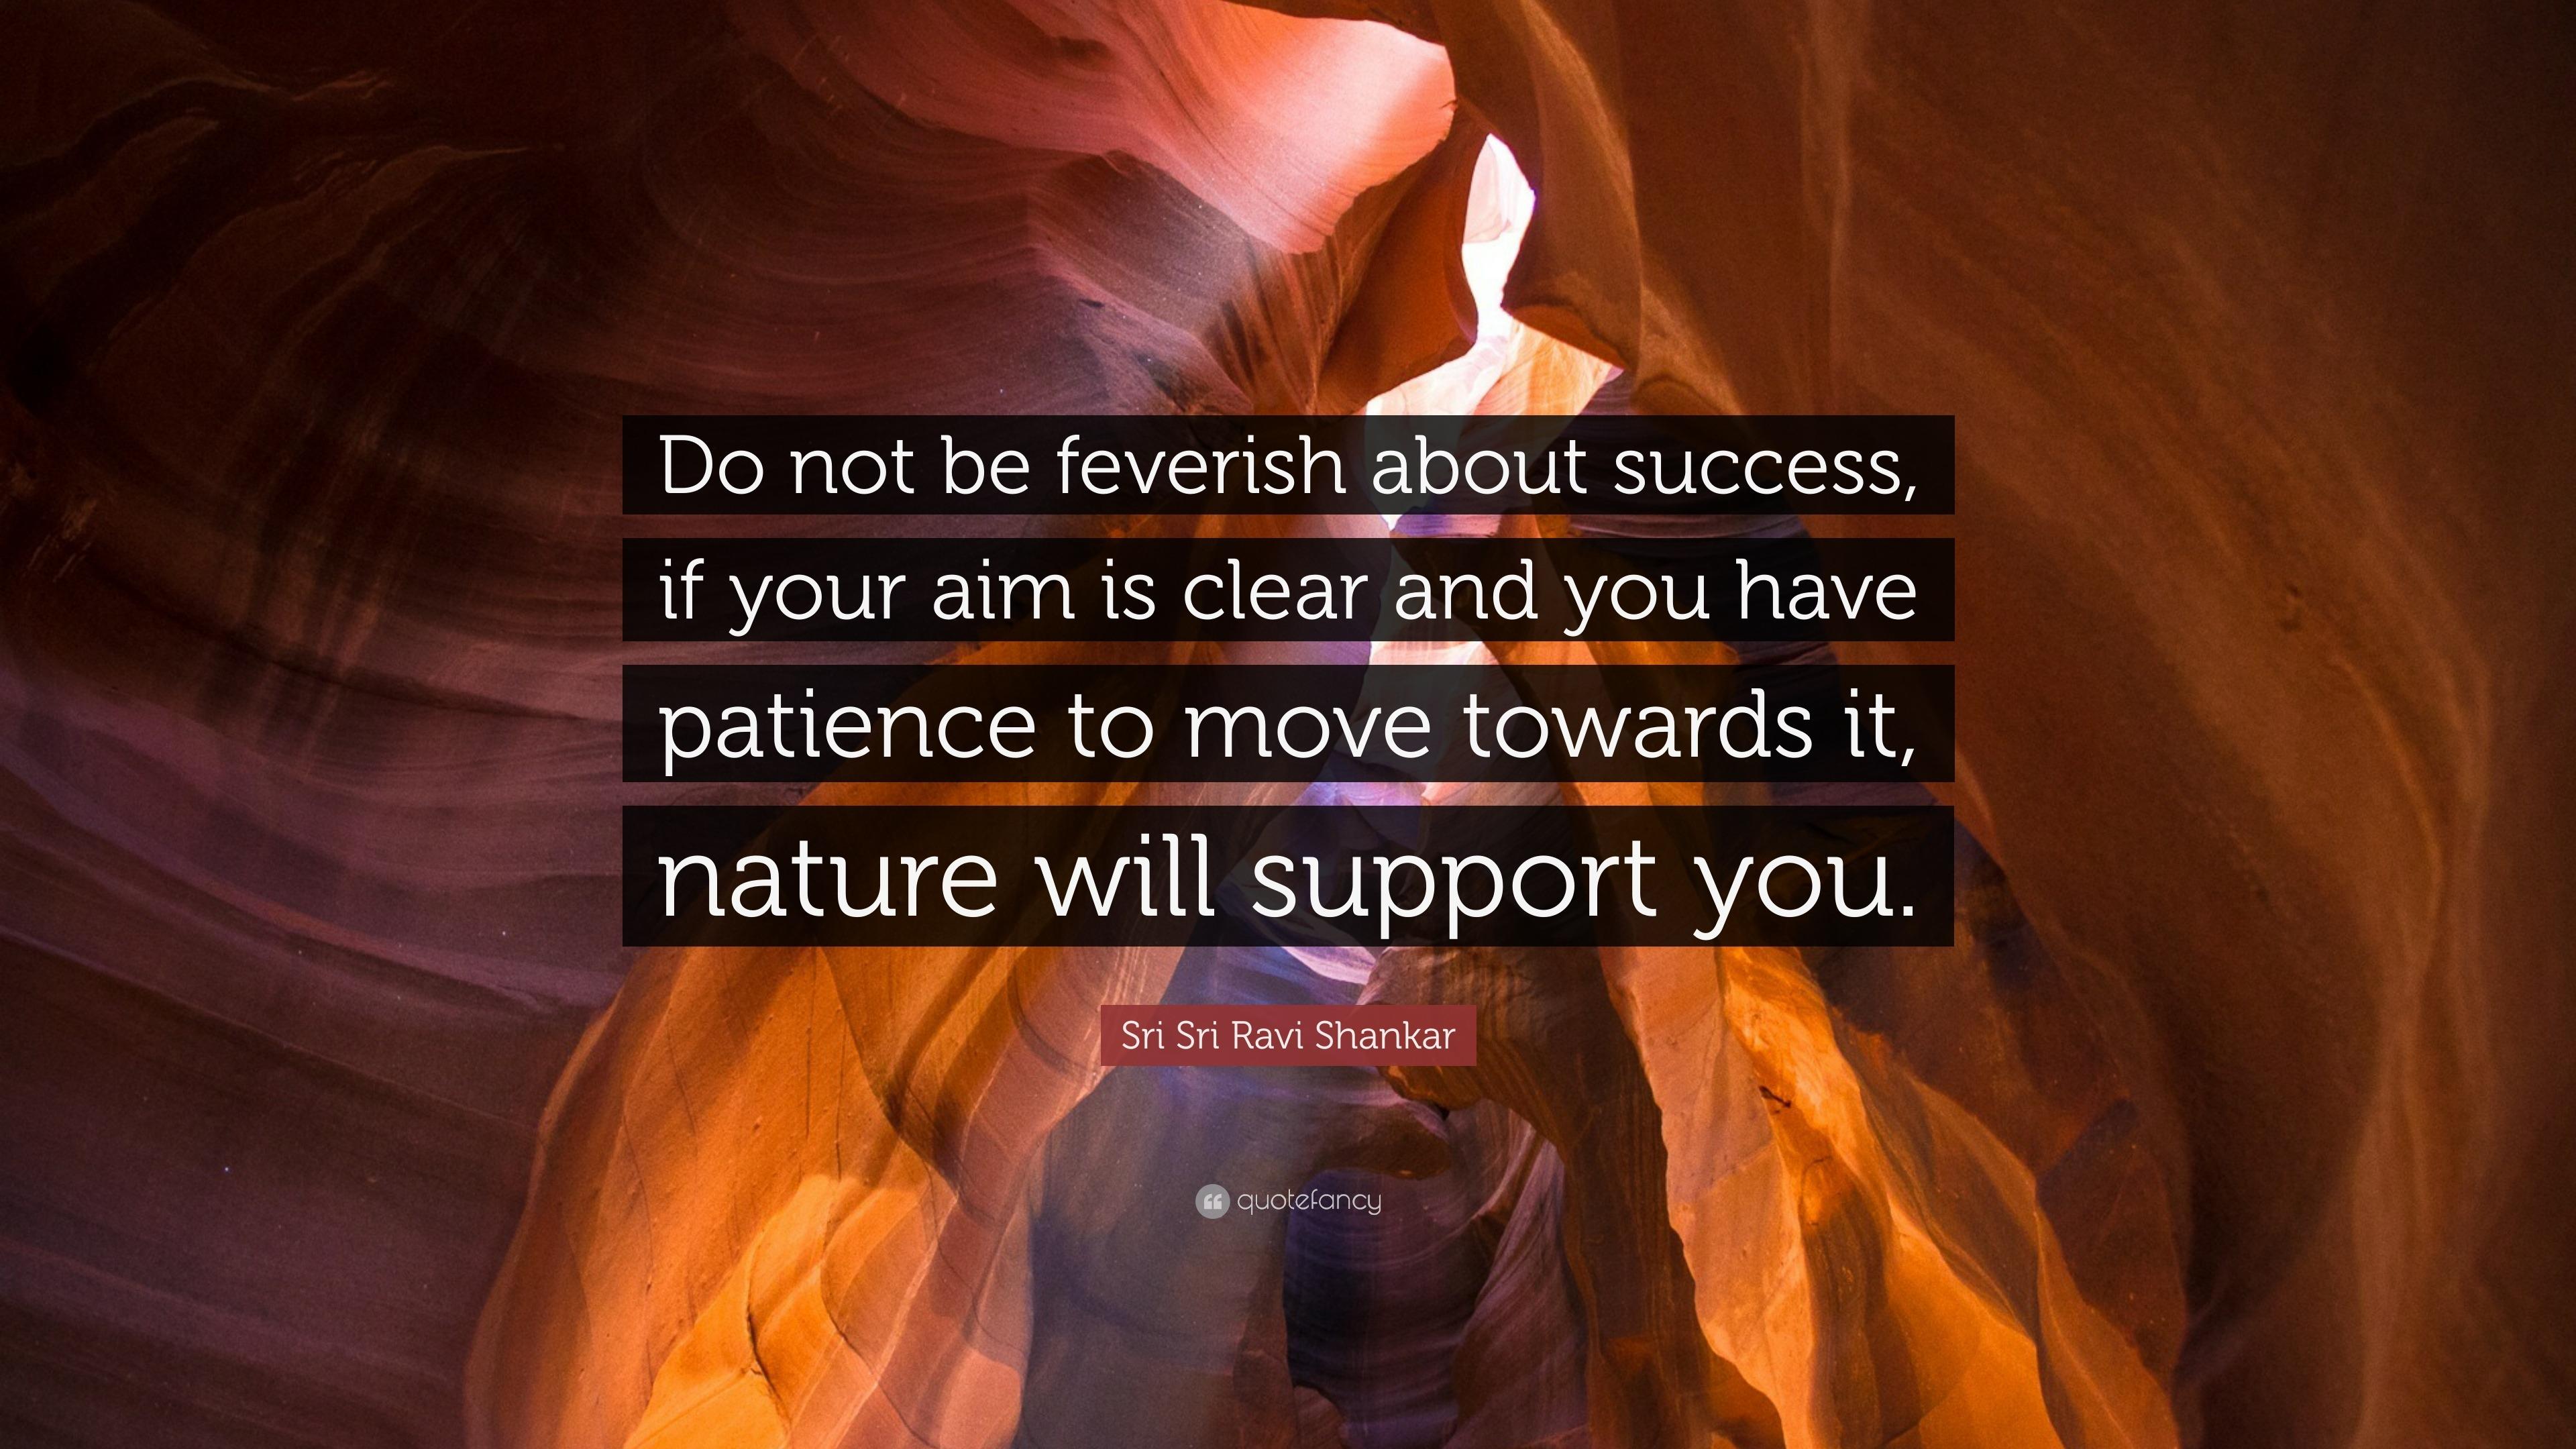 Sri Sri Ravi Shankar Quote Do Not Be Feverish About Success If